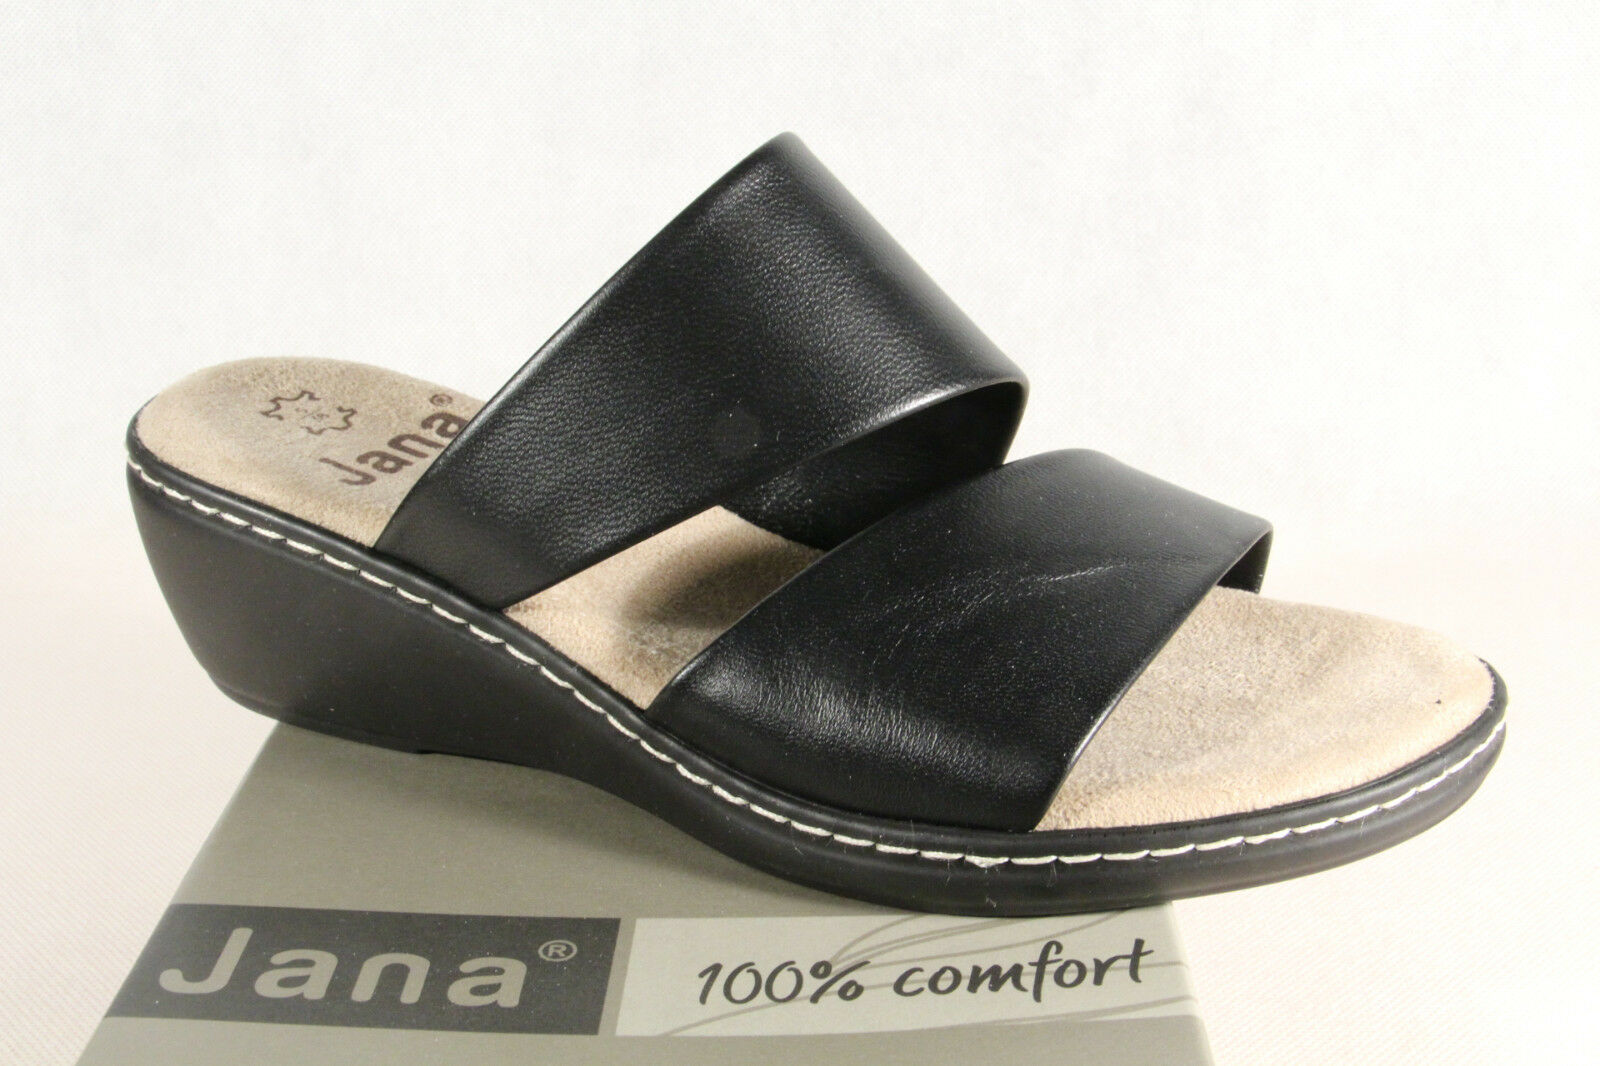 Jana Damen Pantolette Sandalen Sandaletten schwarz, Weite G 27505 NEU